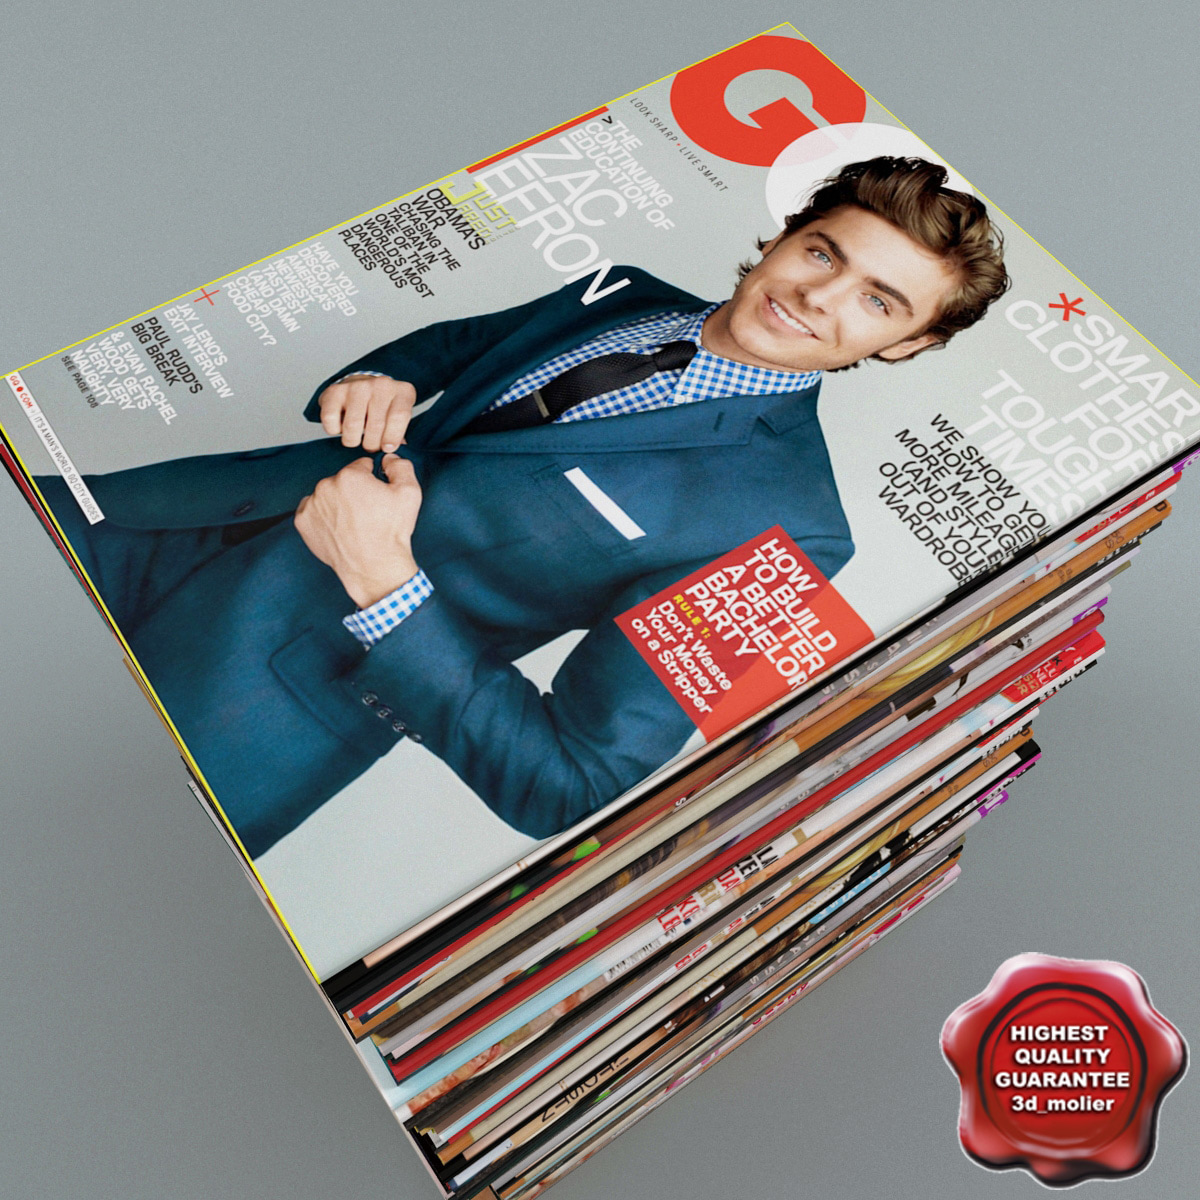 Magazines_Collection_00.jpg